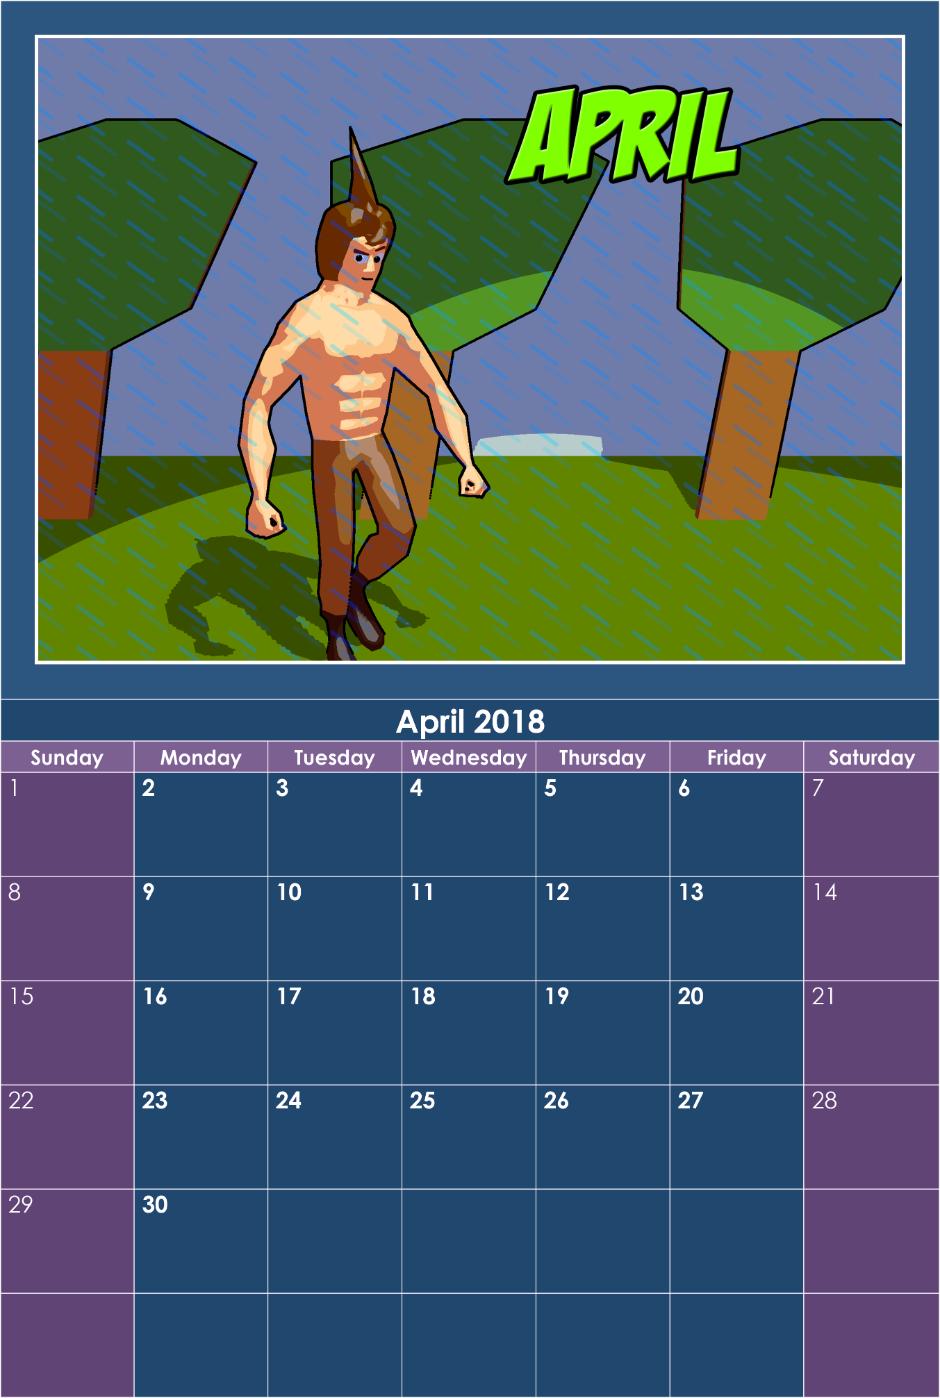 snuffysam - April